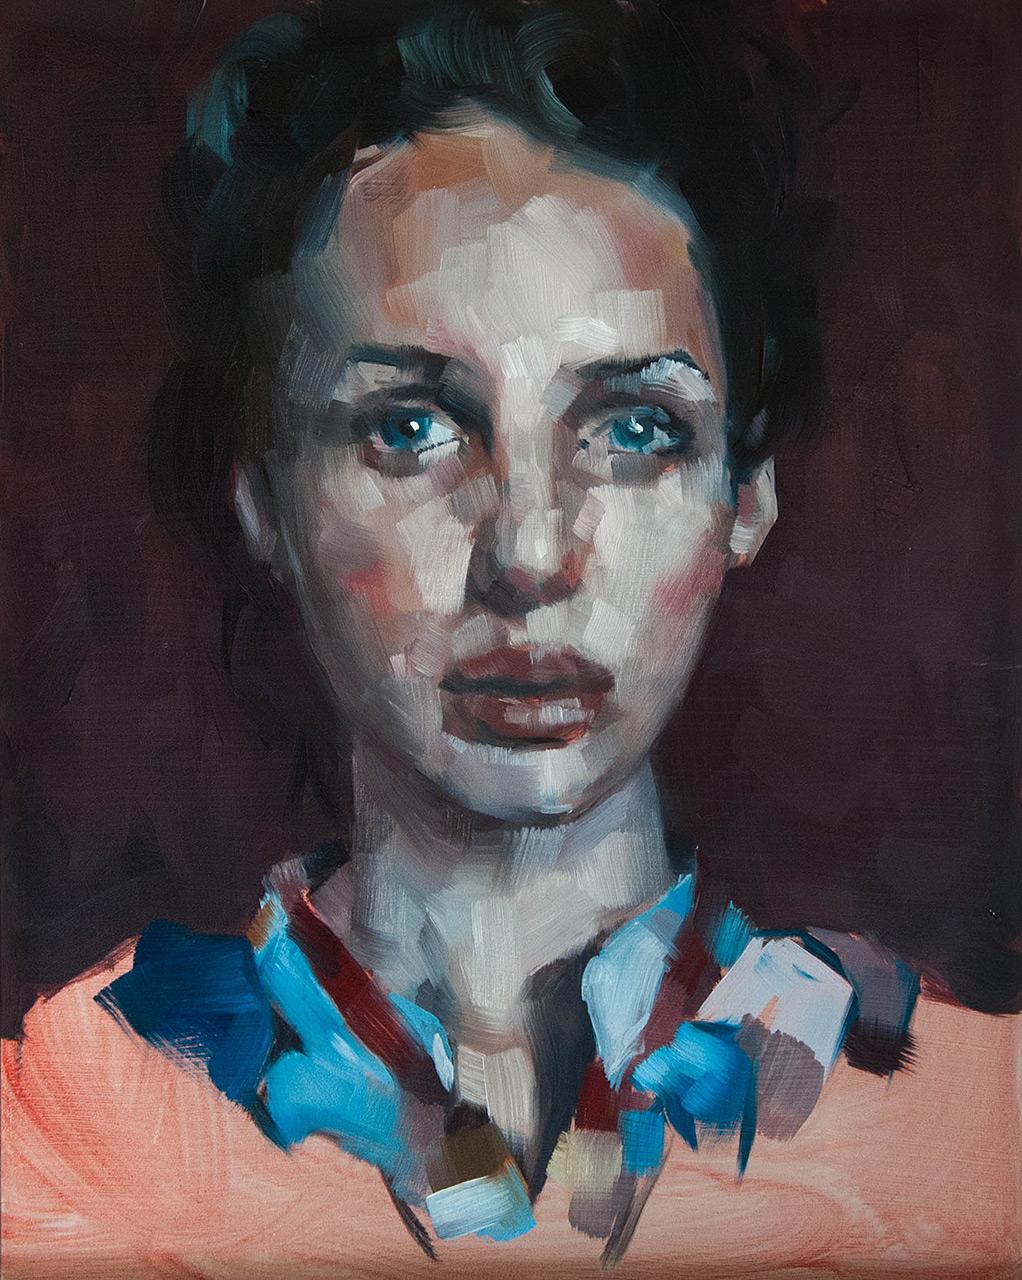 Megan-Skye by mikecreighton